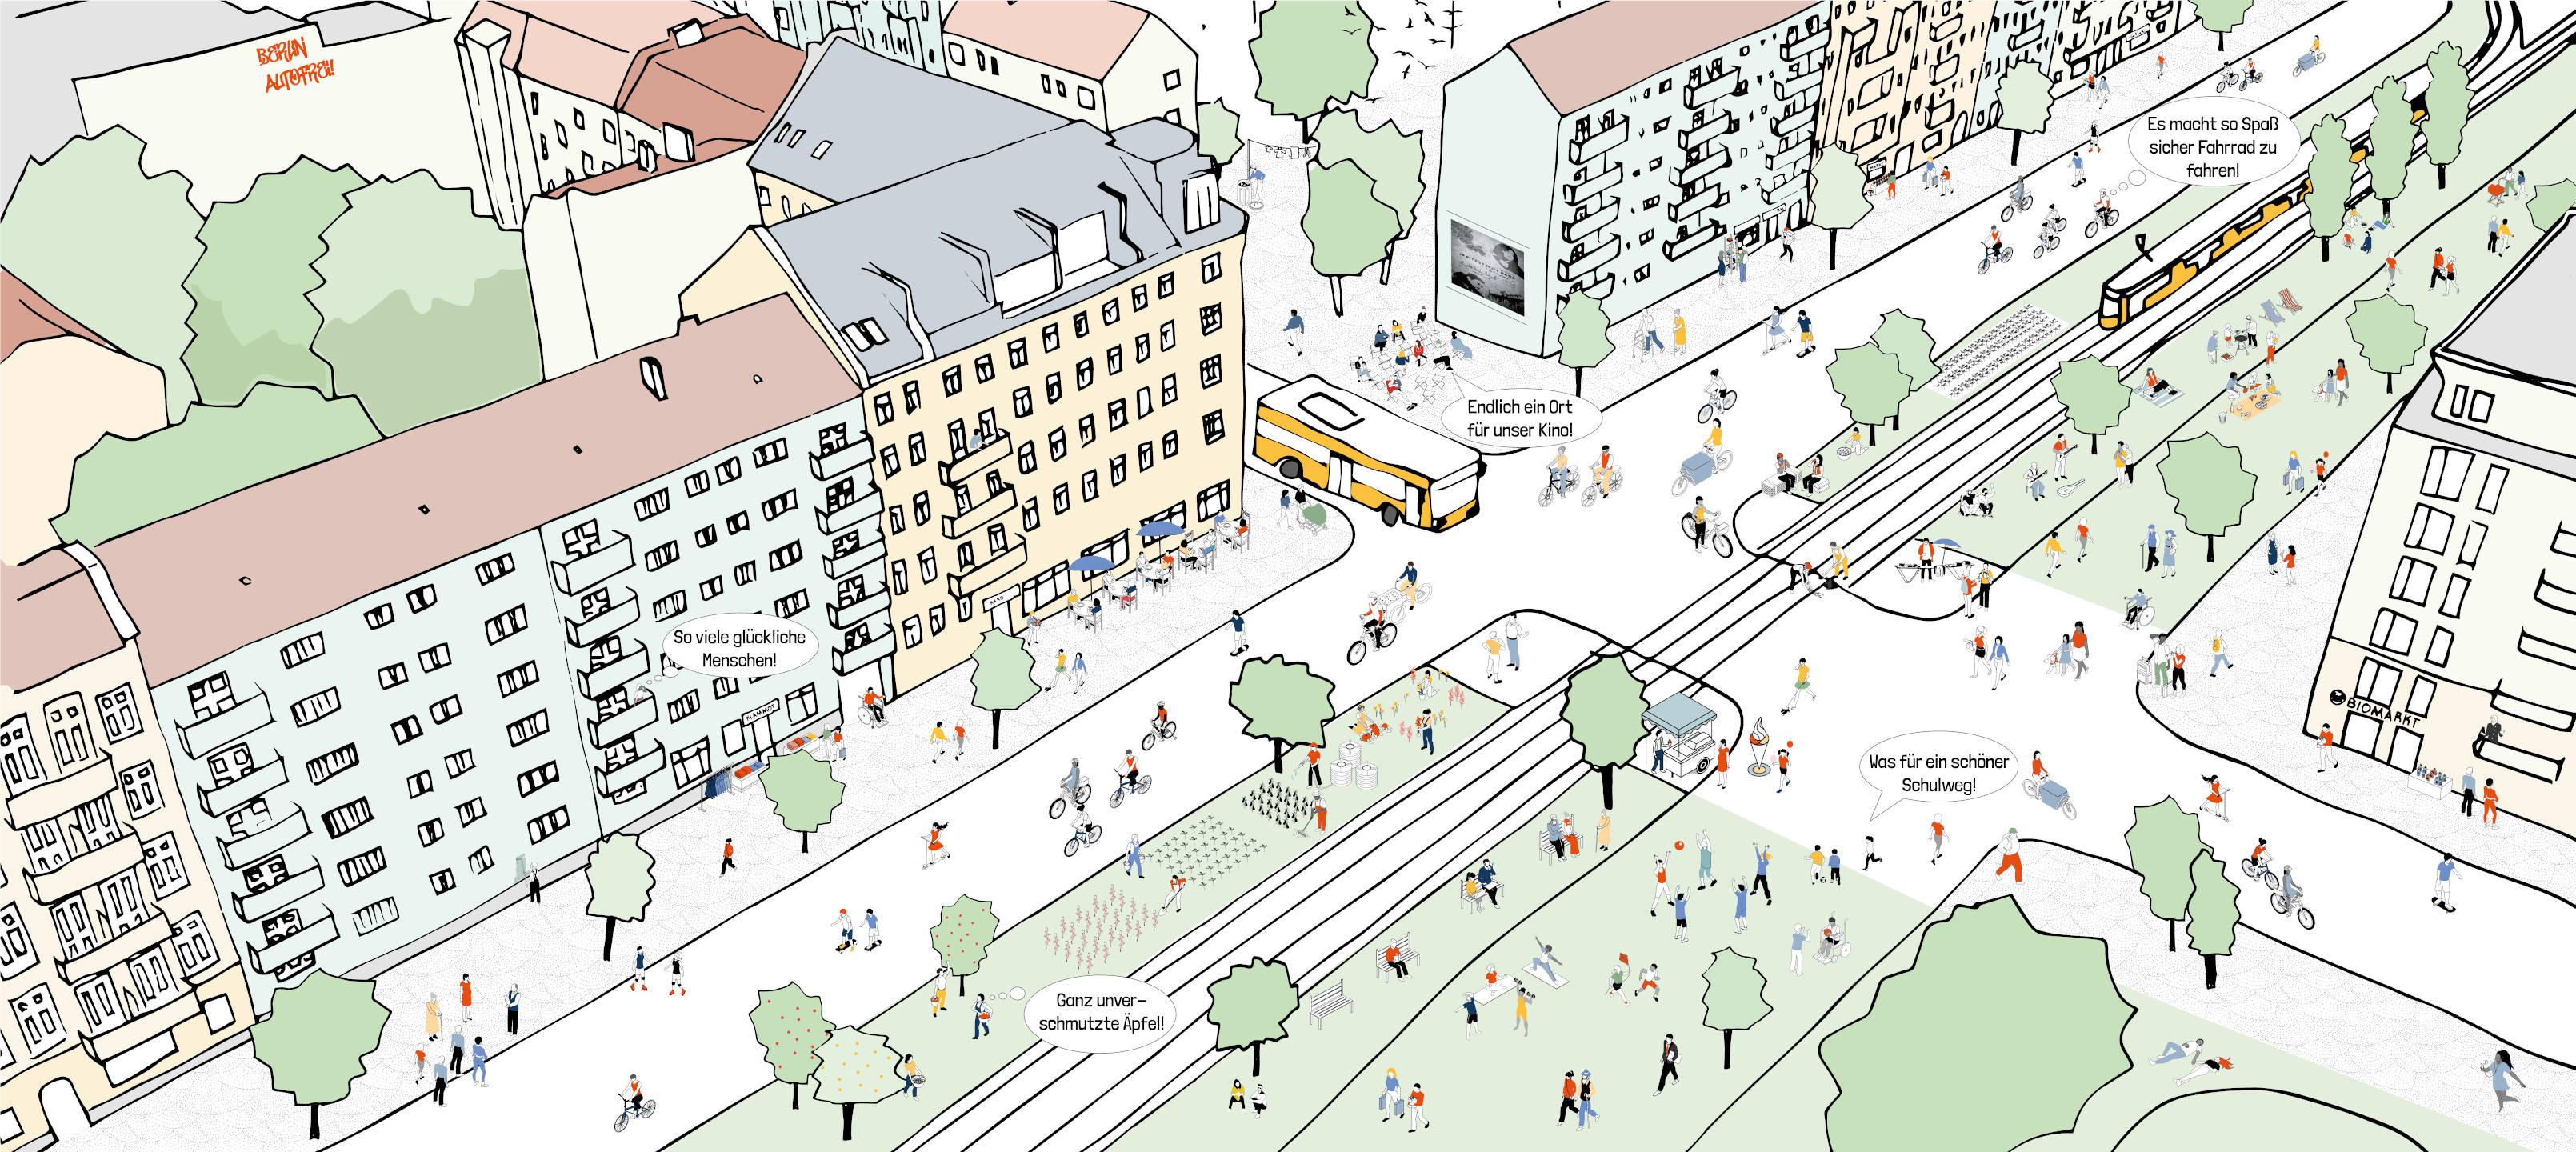 Berlin car-free referendum